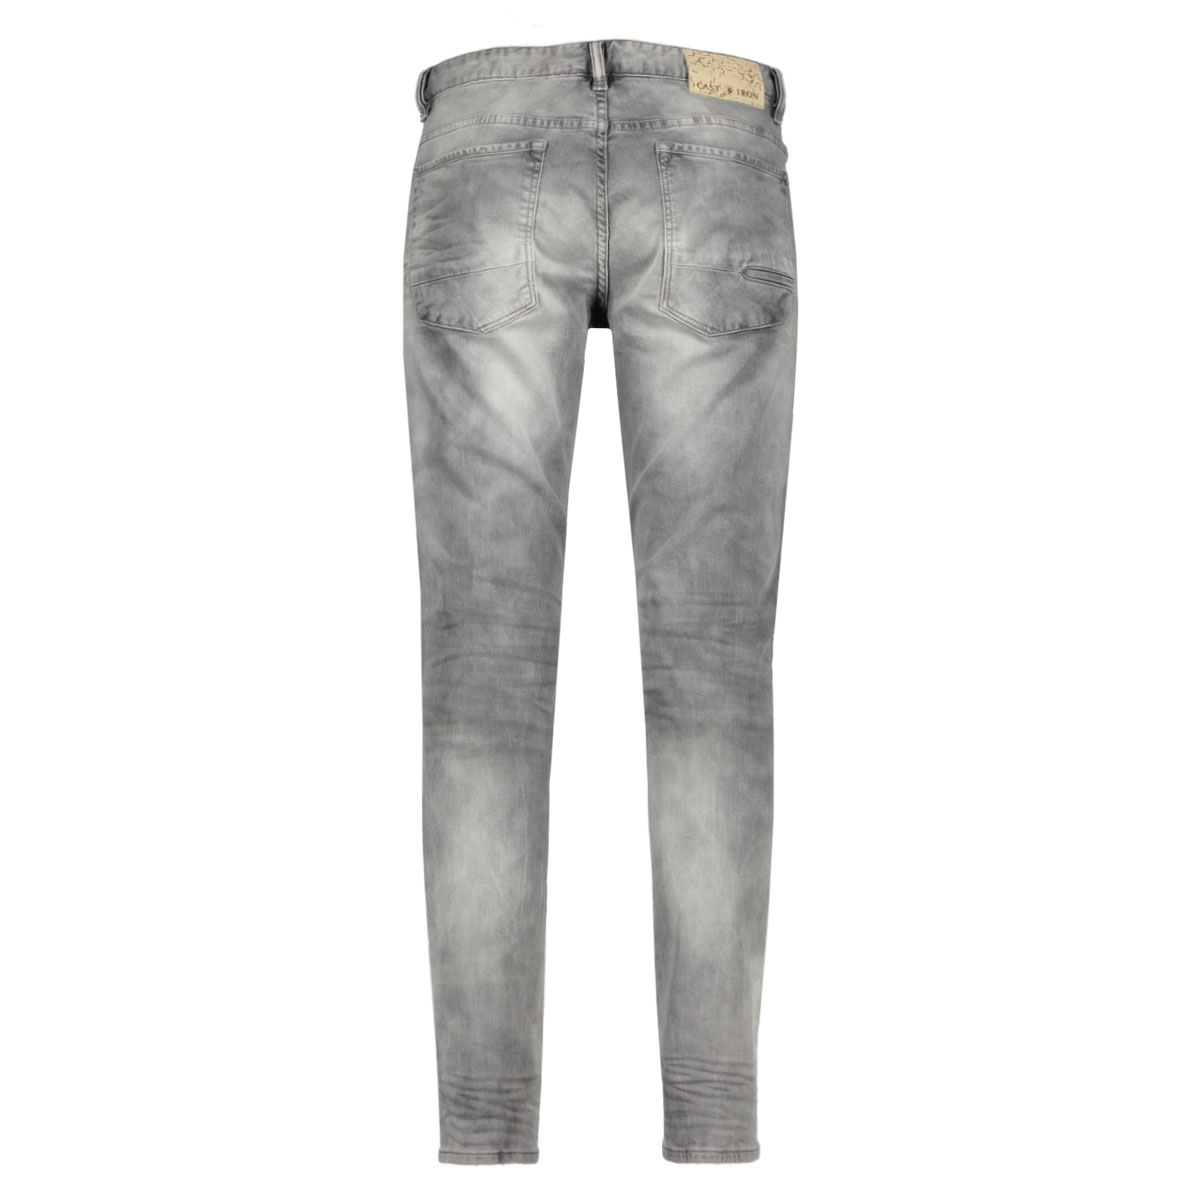 ctr71204 cast iron jeans bgs